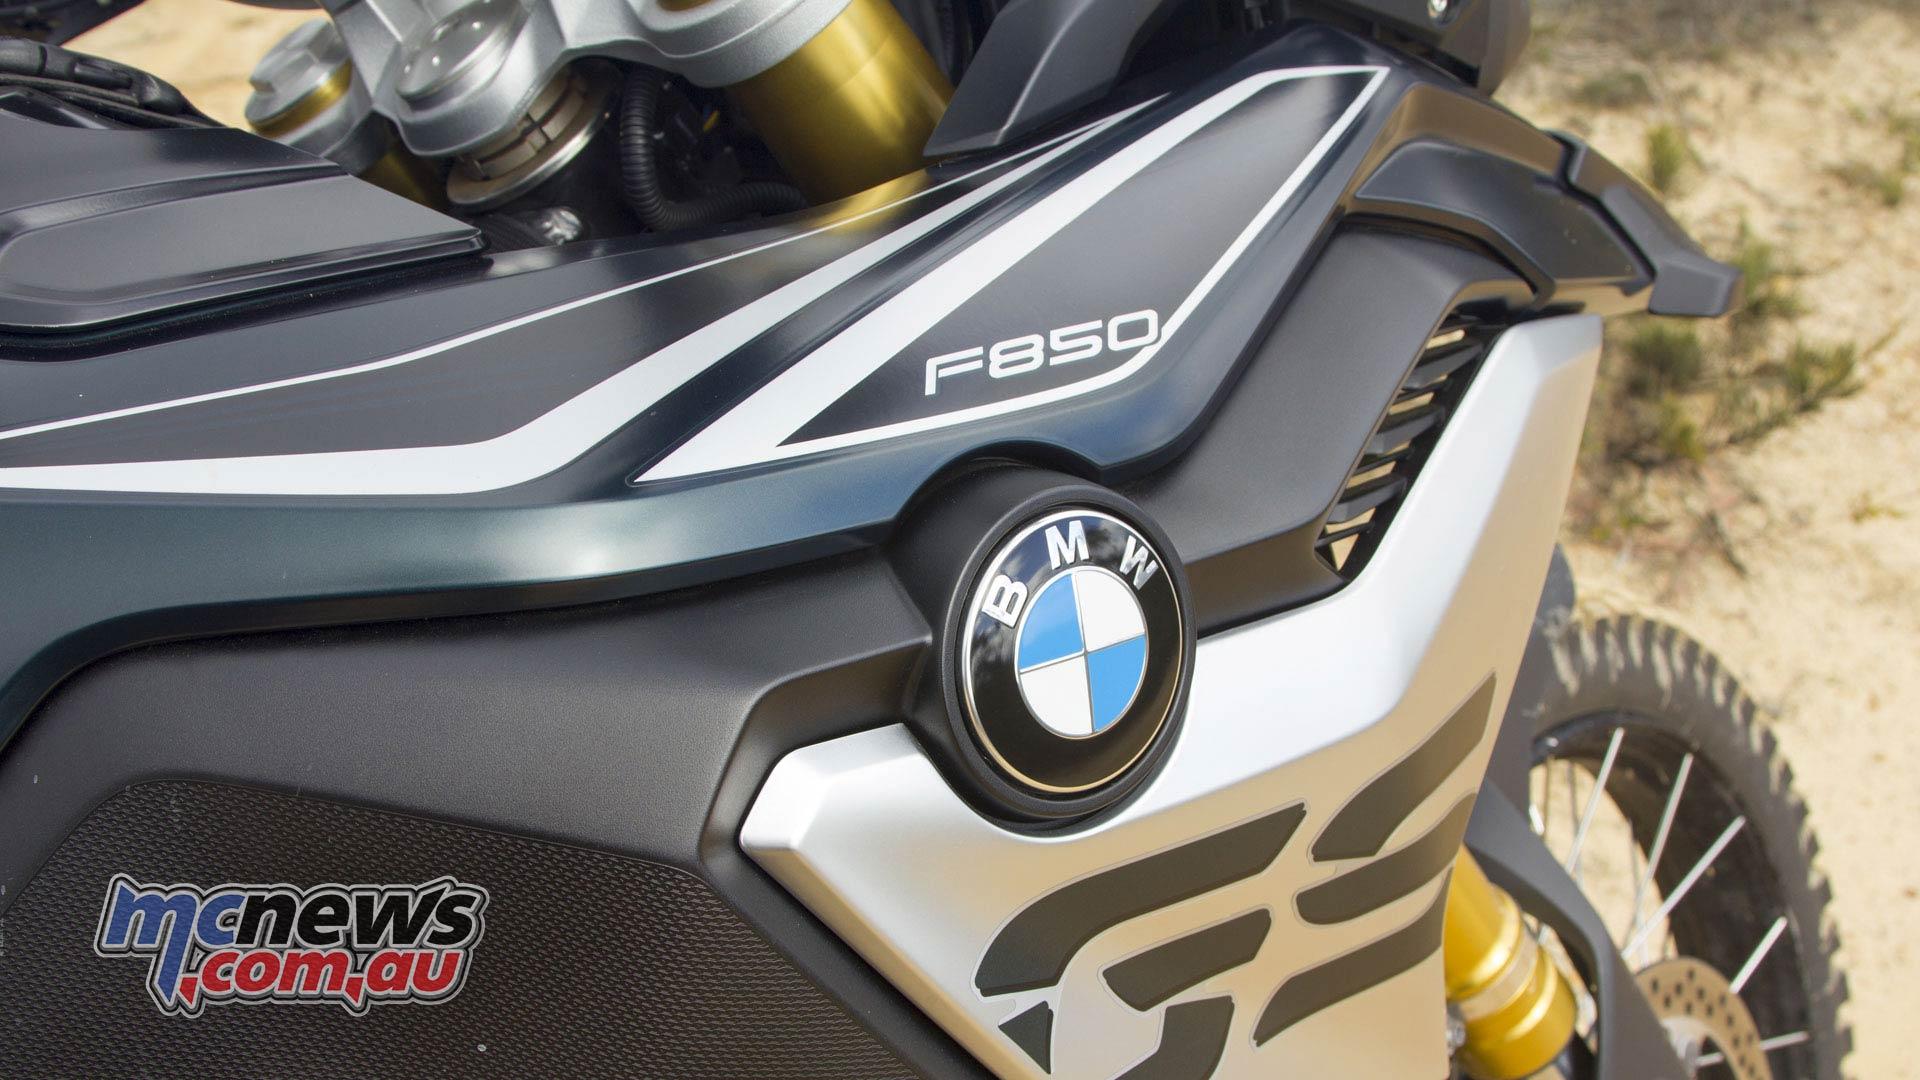 BMW FGS